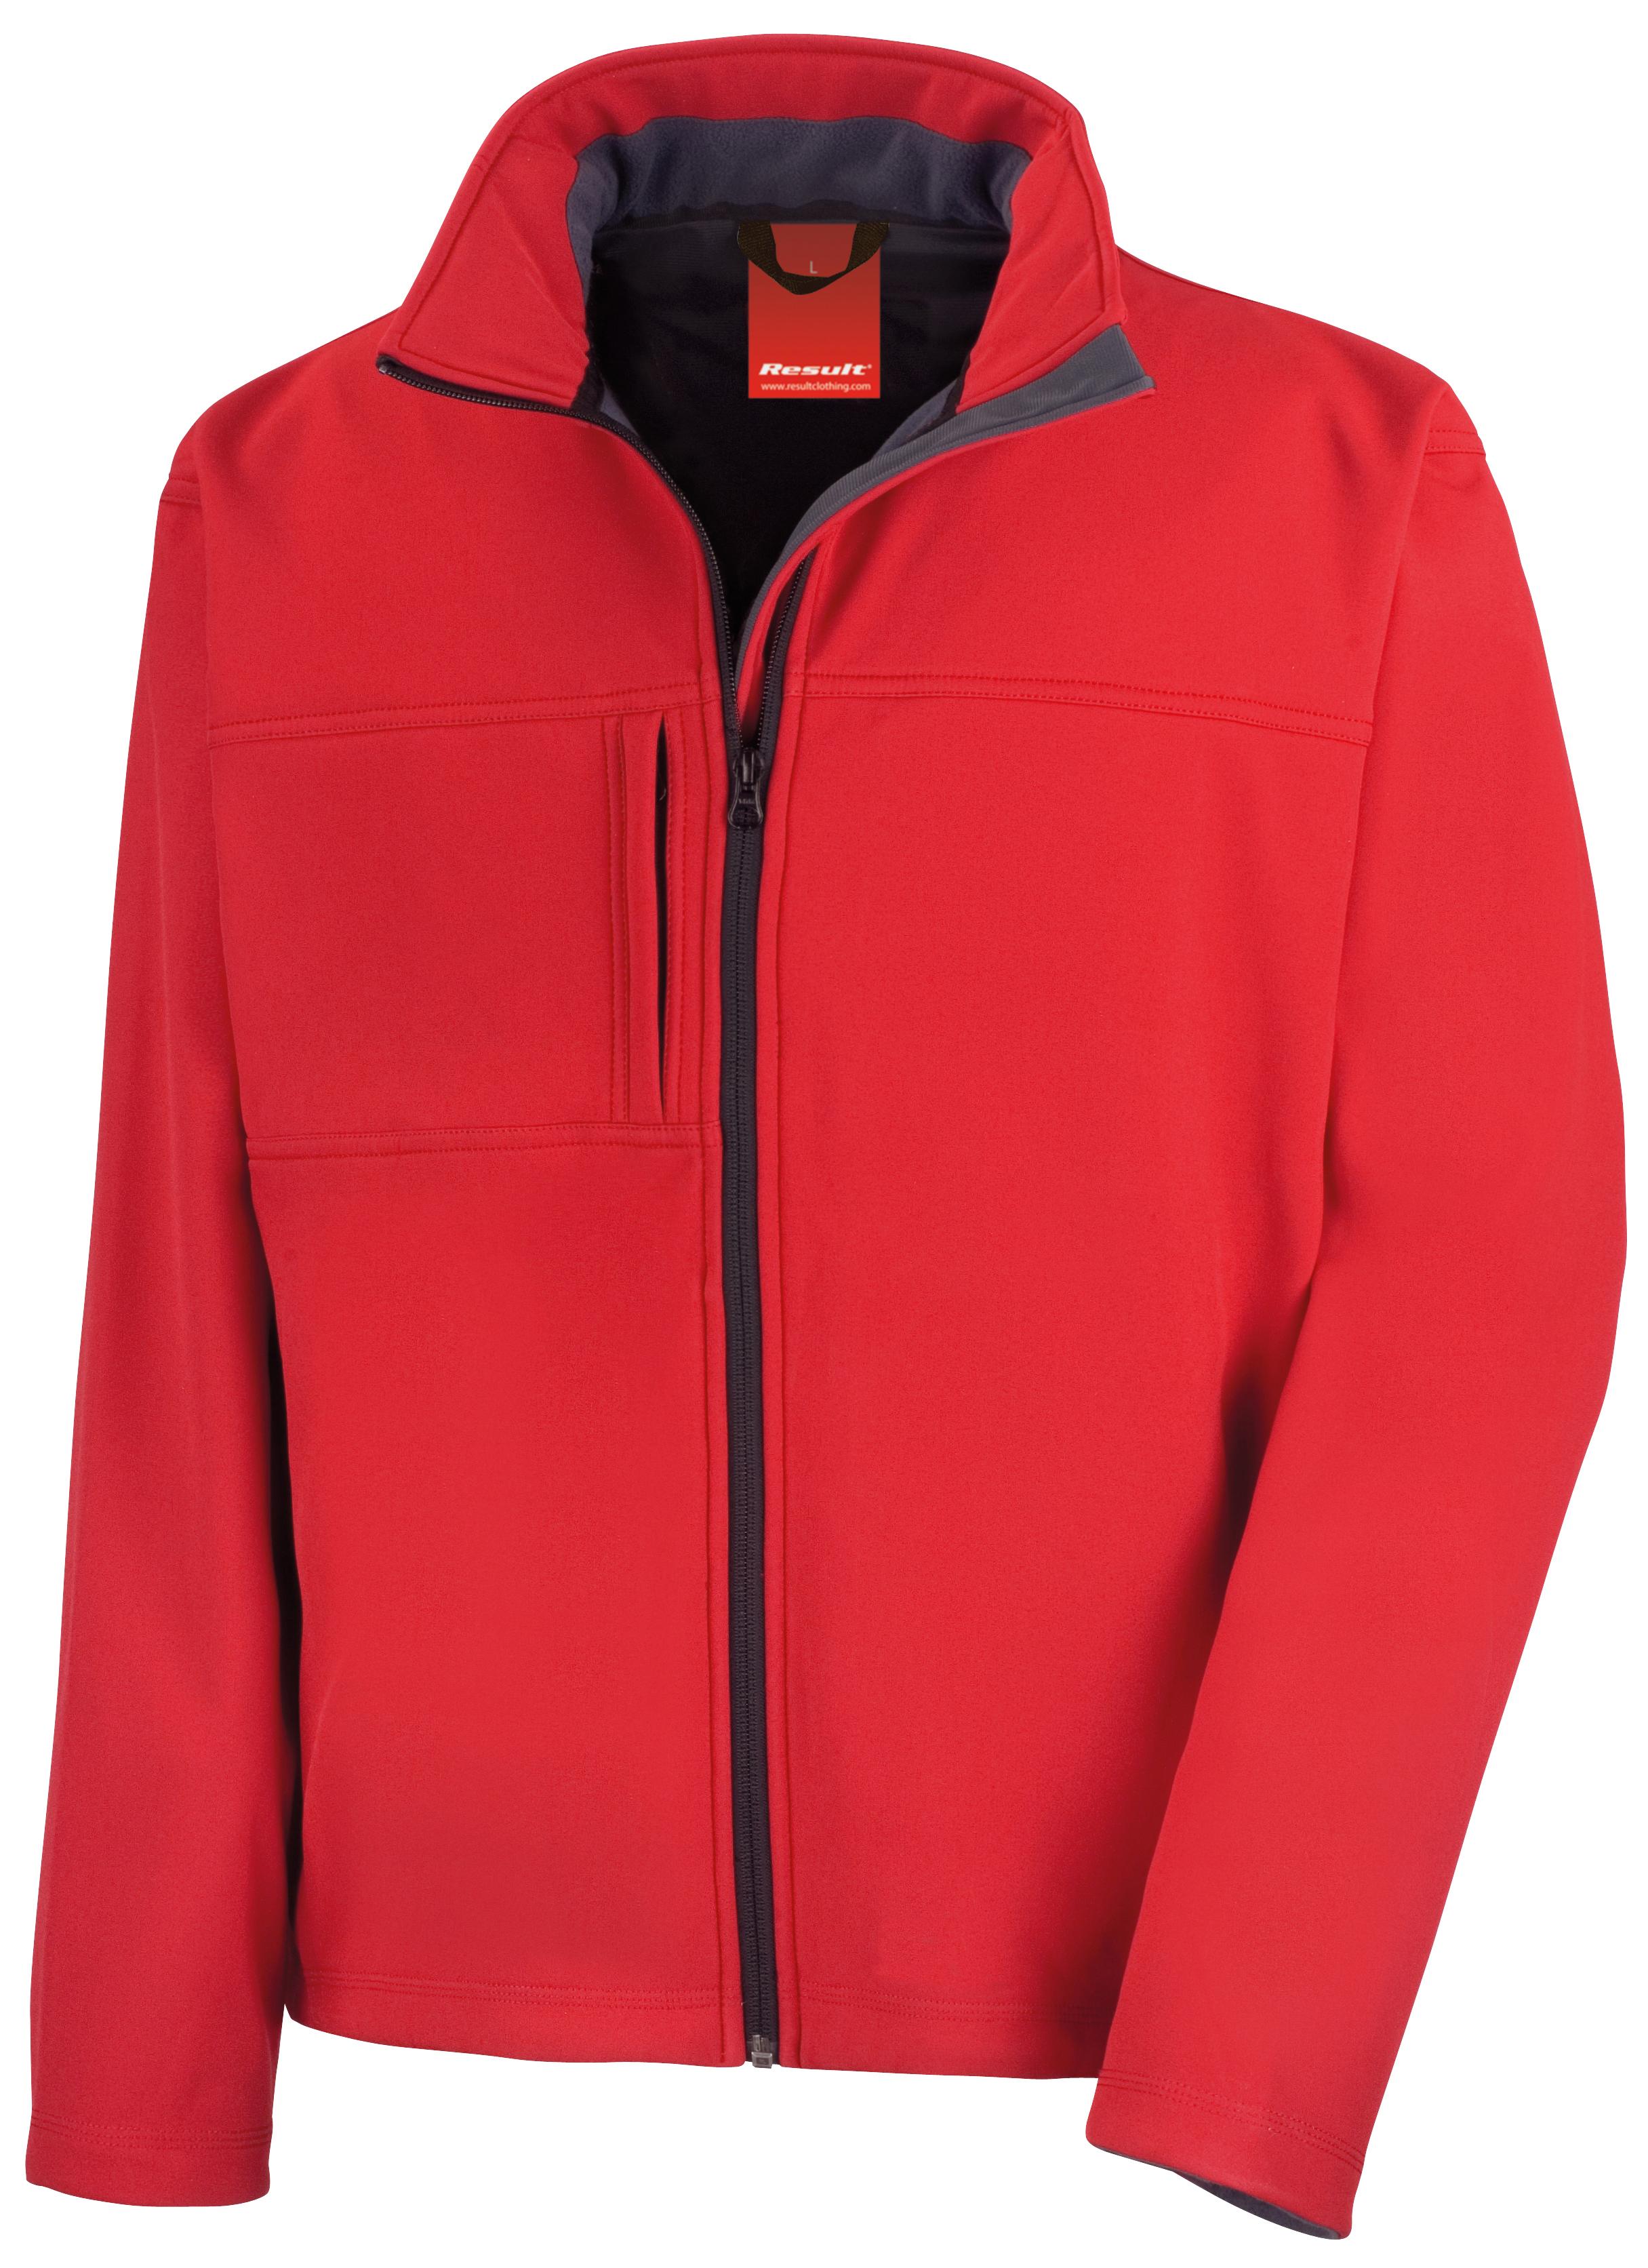 soft stanford men sale for electric s ferrari clothing softshell jackets online c blue shell wholesale jacket ski trespass